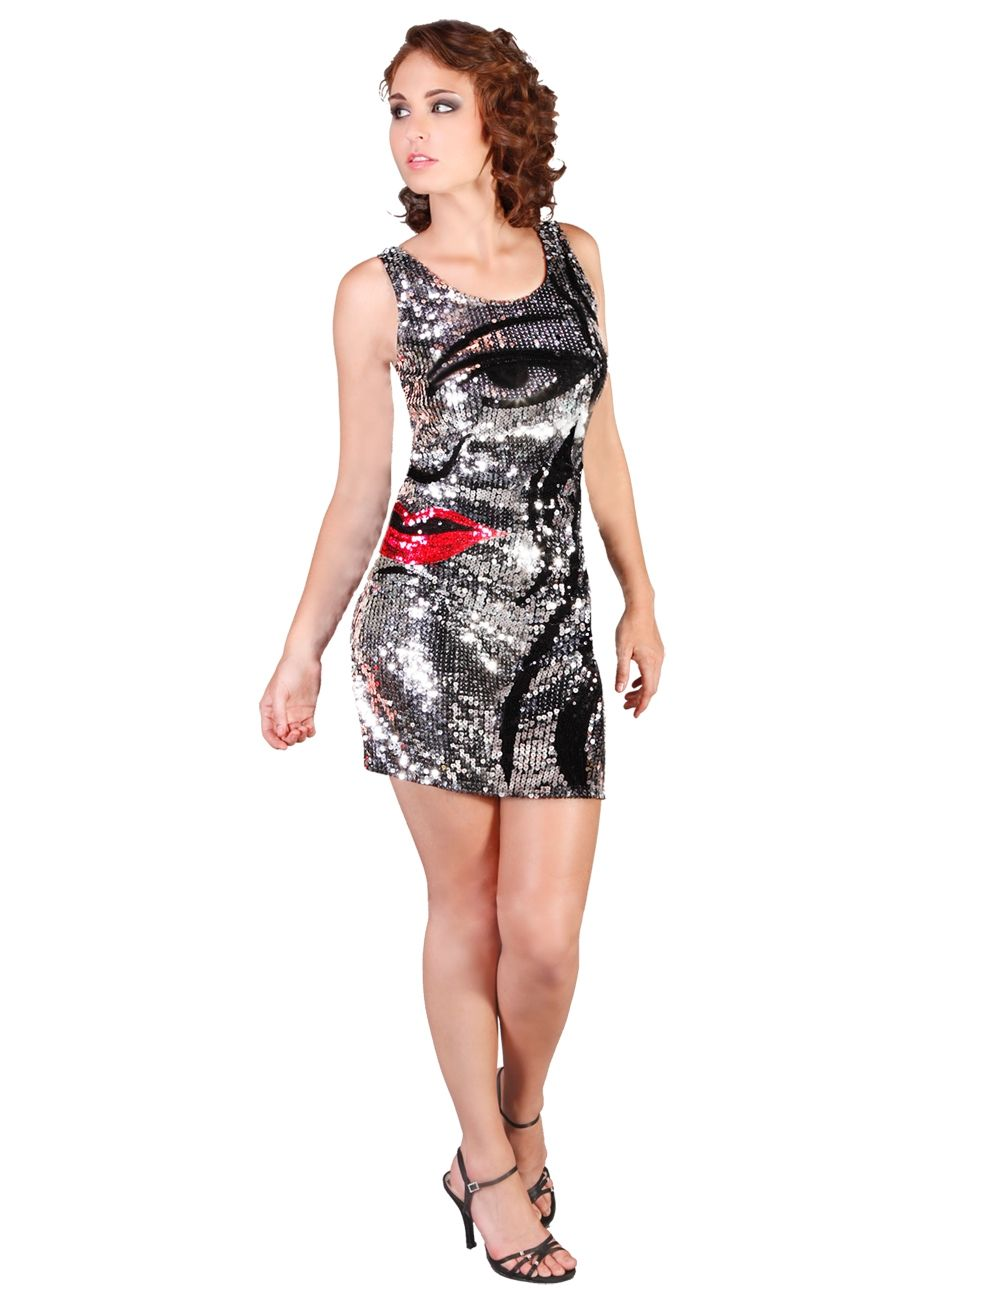 Interlude 1960 Dress Dresses